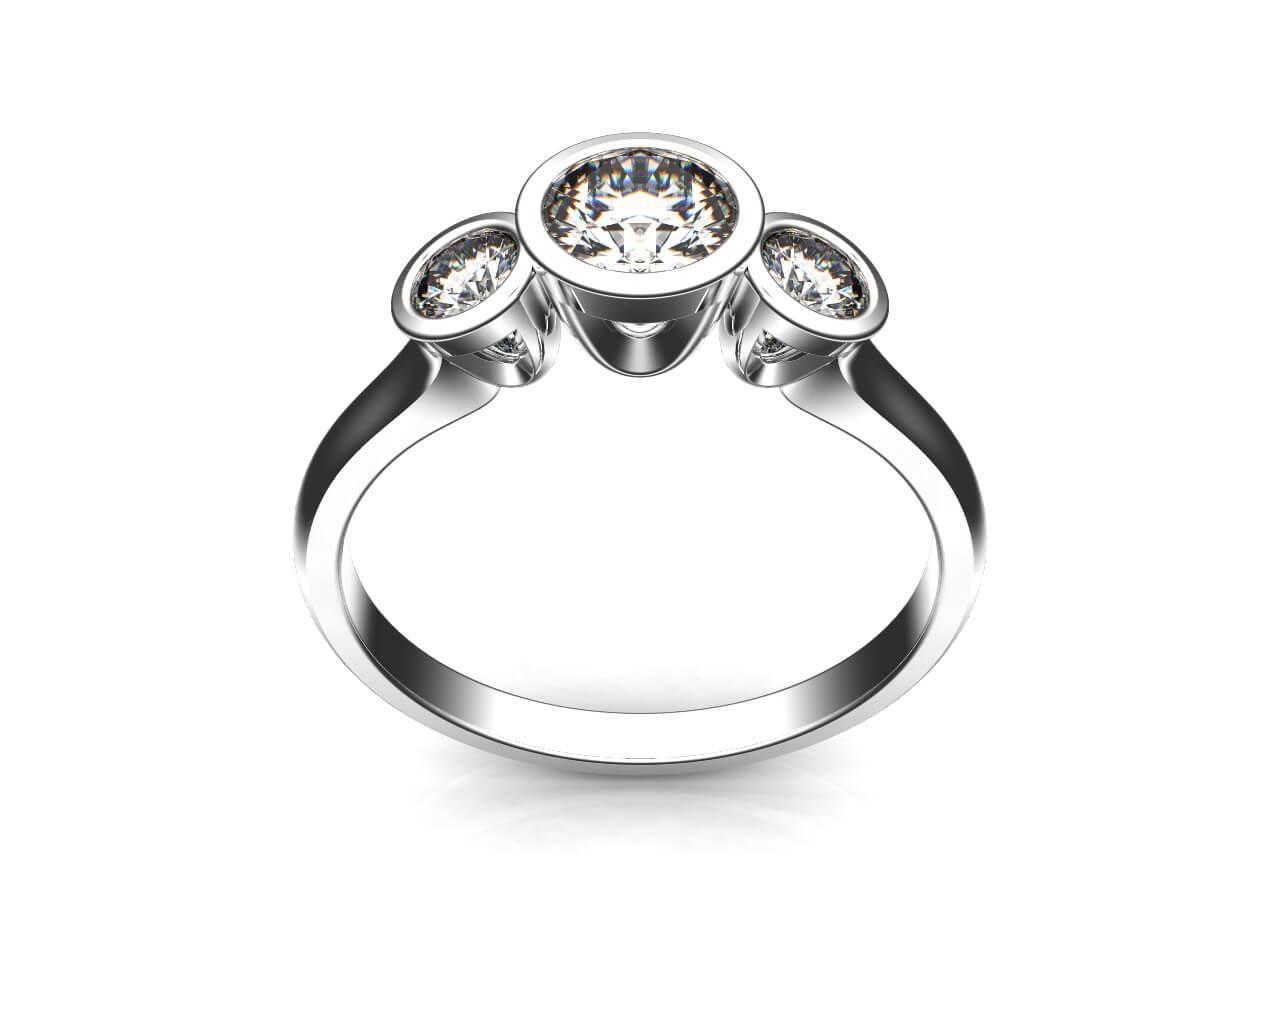 Round Brilliant Cut Diamond Trilogy Engagement Ring, Bezel Set Stones on a Thin Plain Polished Band.